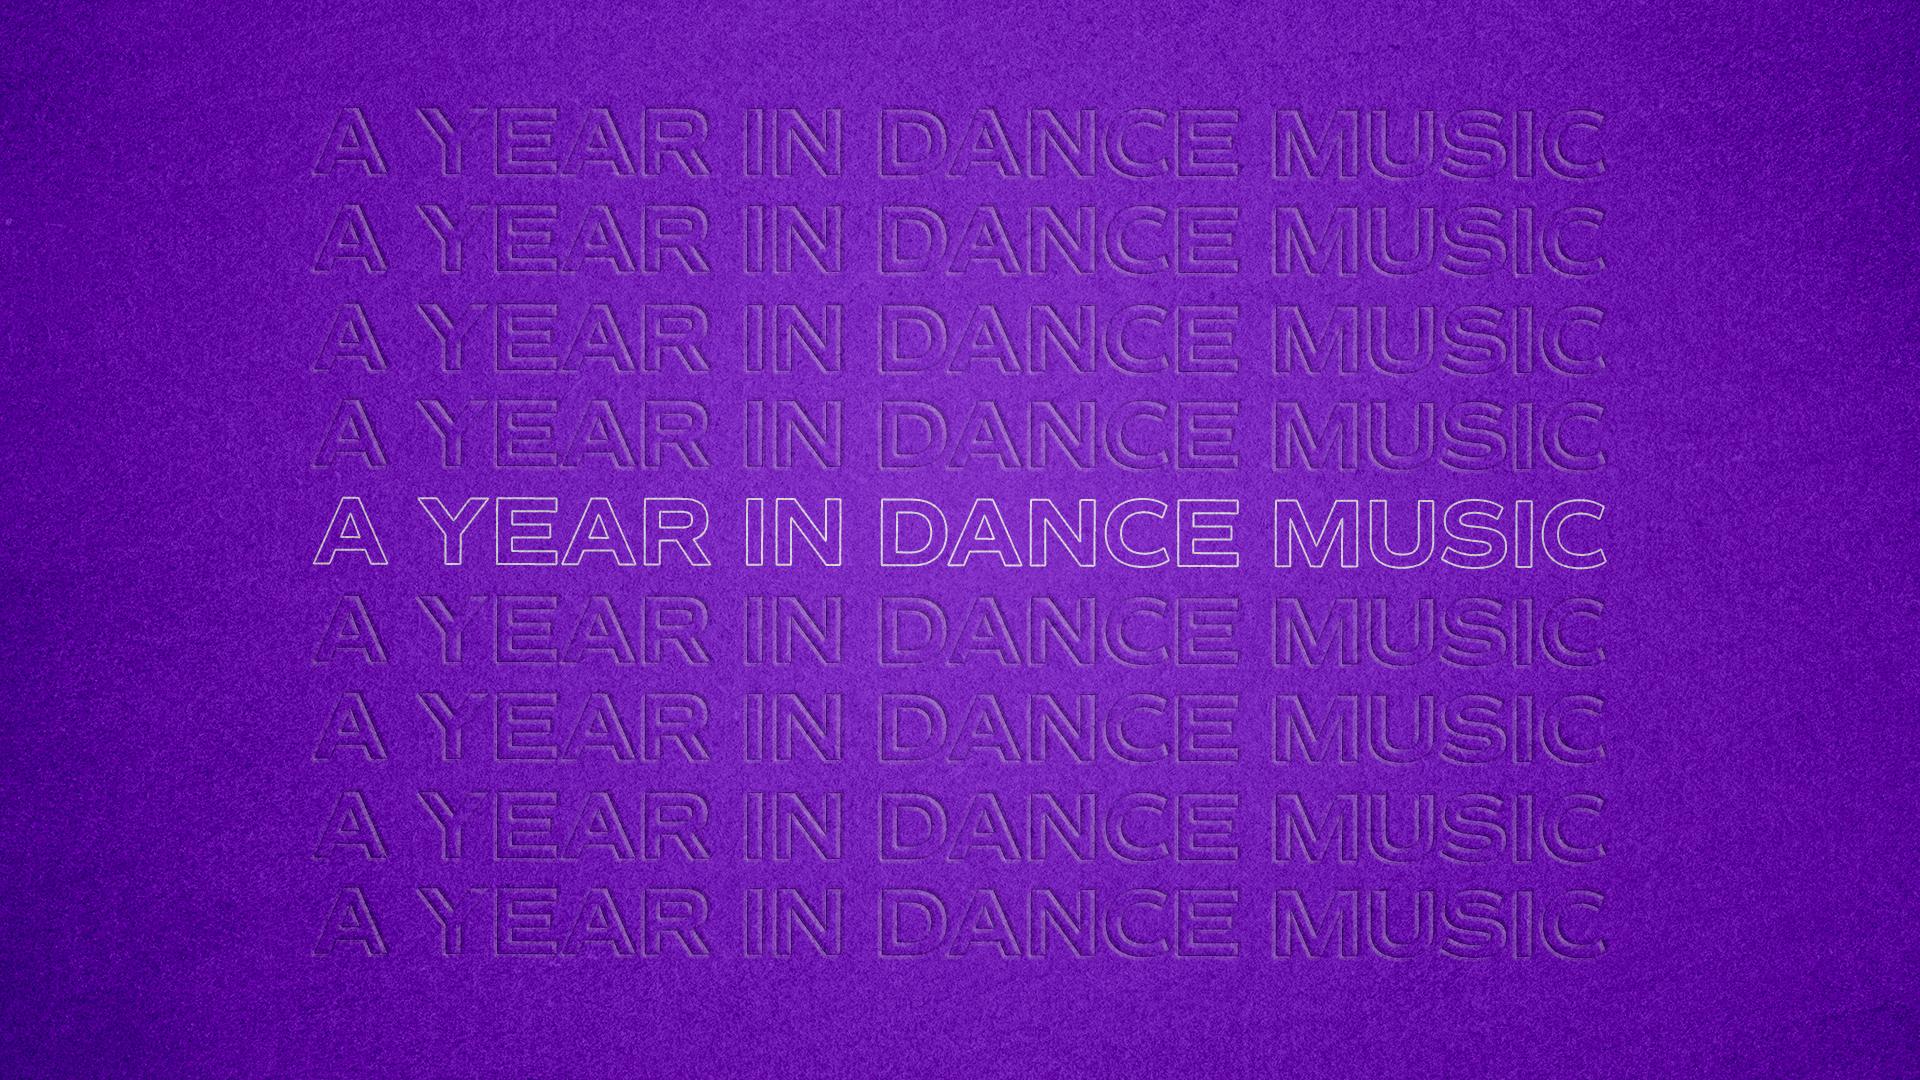 Year in Dance Music Header Image